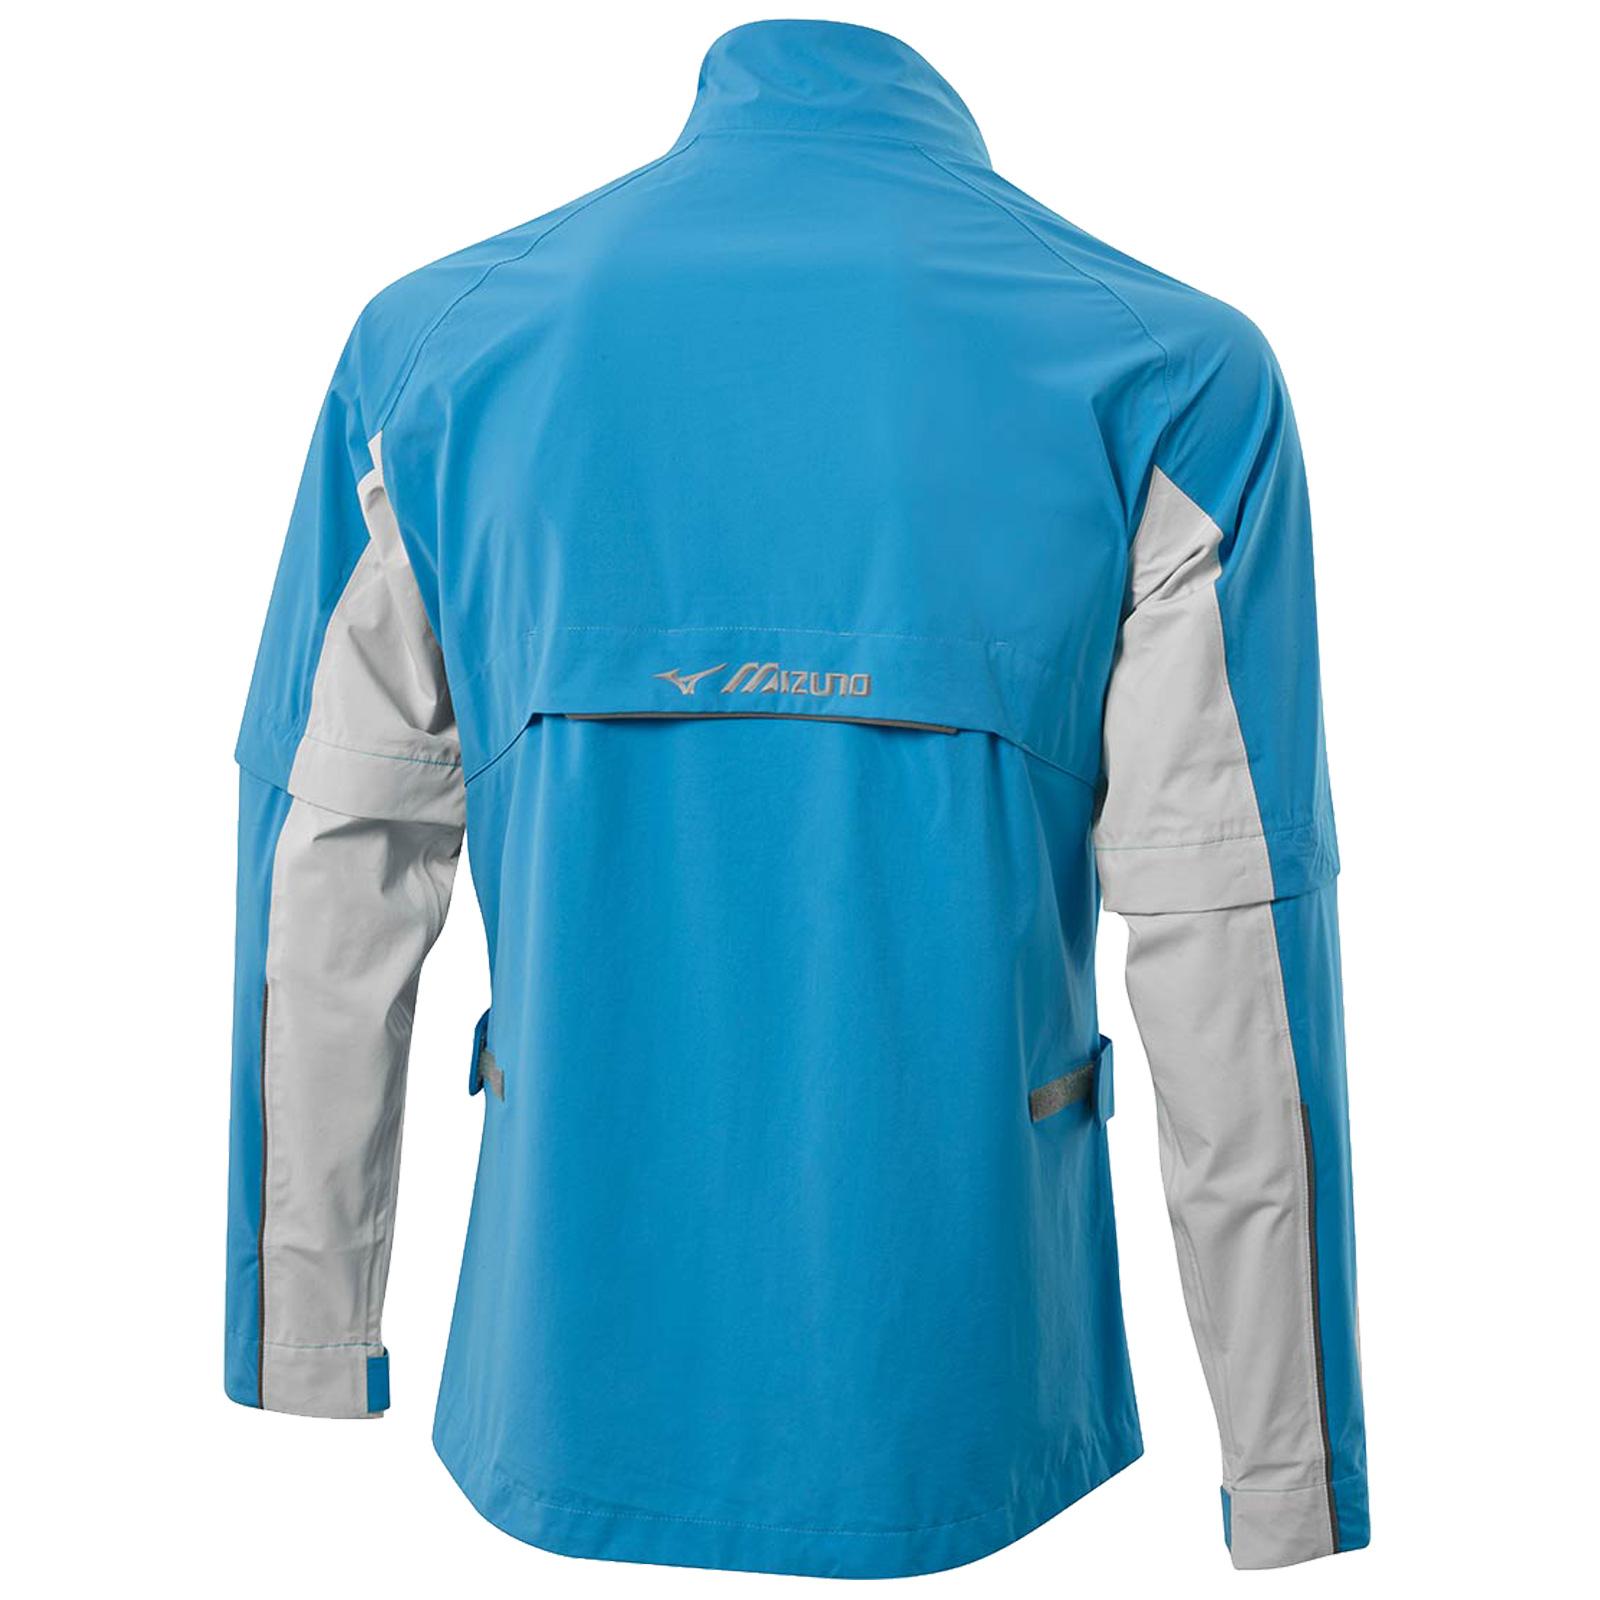 Mizuno-Mens-Impermalite-F20-Waterproof-Rain-Jacket-Top-Lightweight-Coat-Golf thumbnail 5